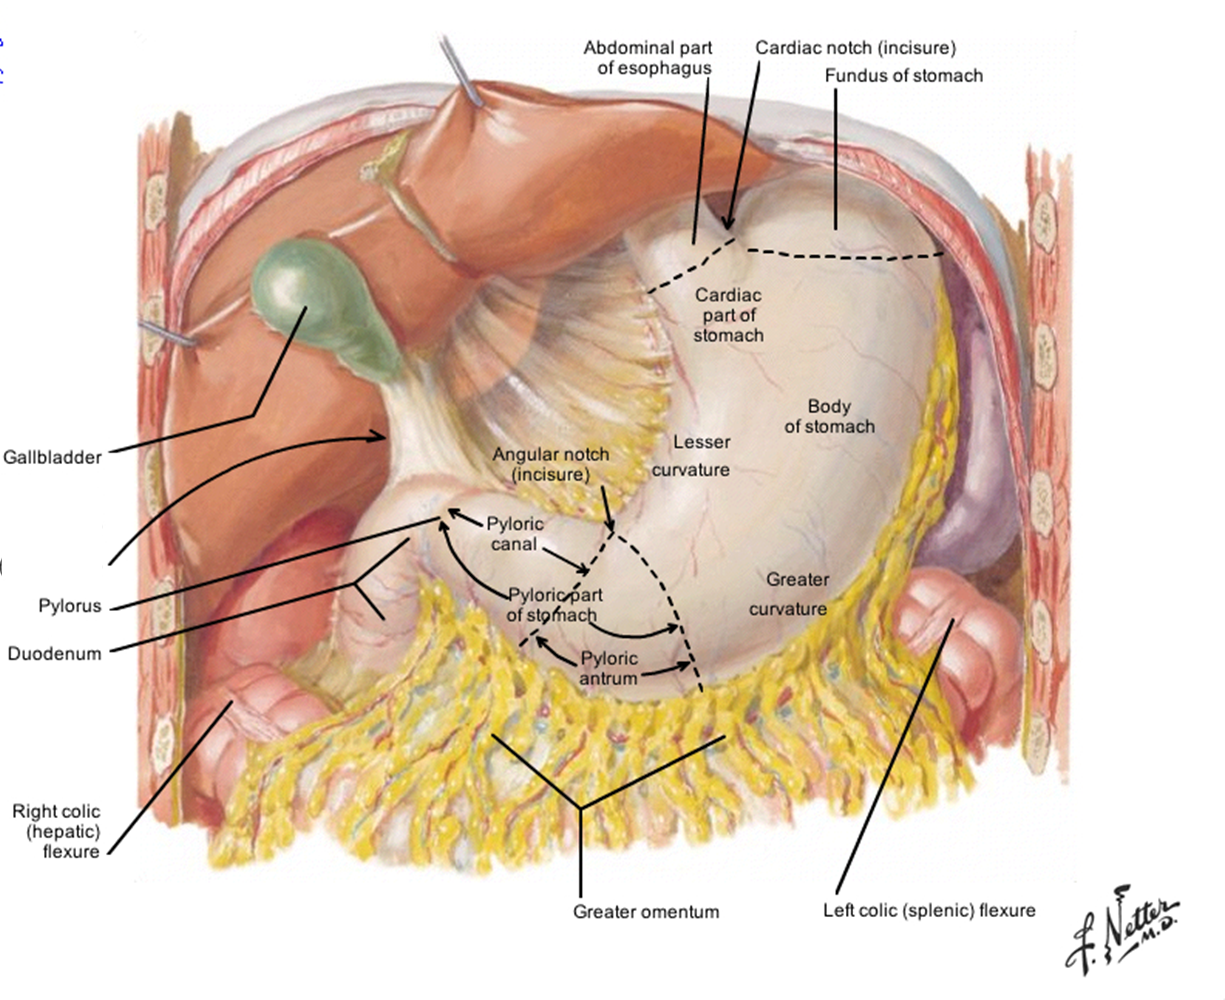 stomach anatomy - Google Search | Nurse Stuff | Pinterest | Anatomy ...